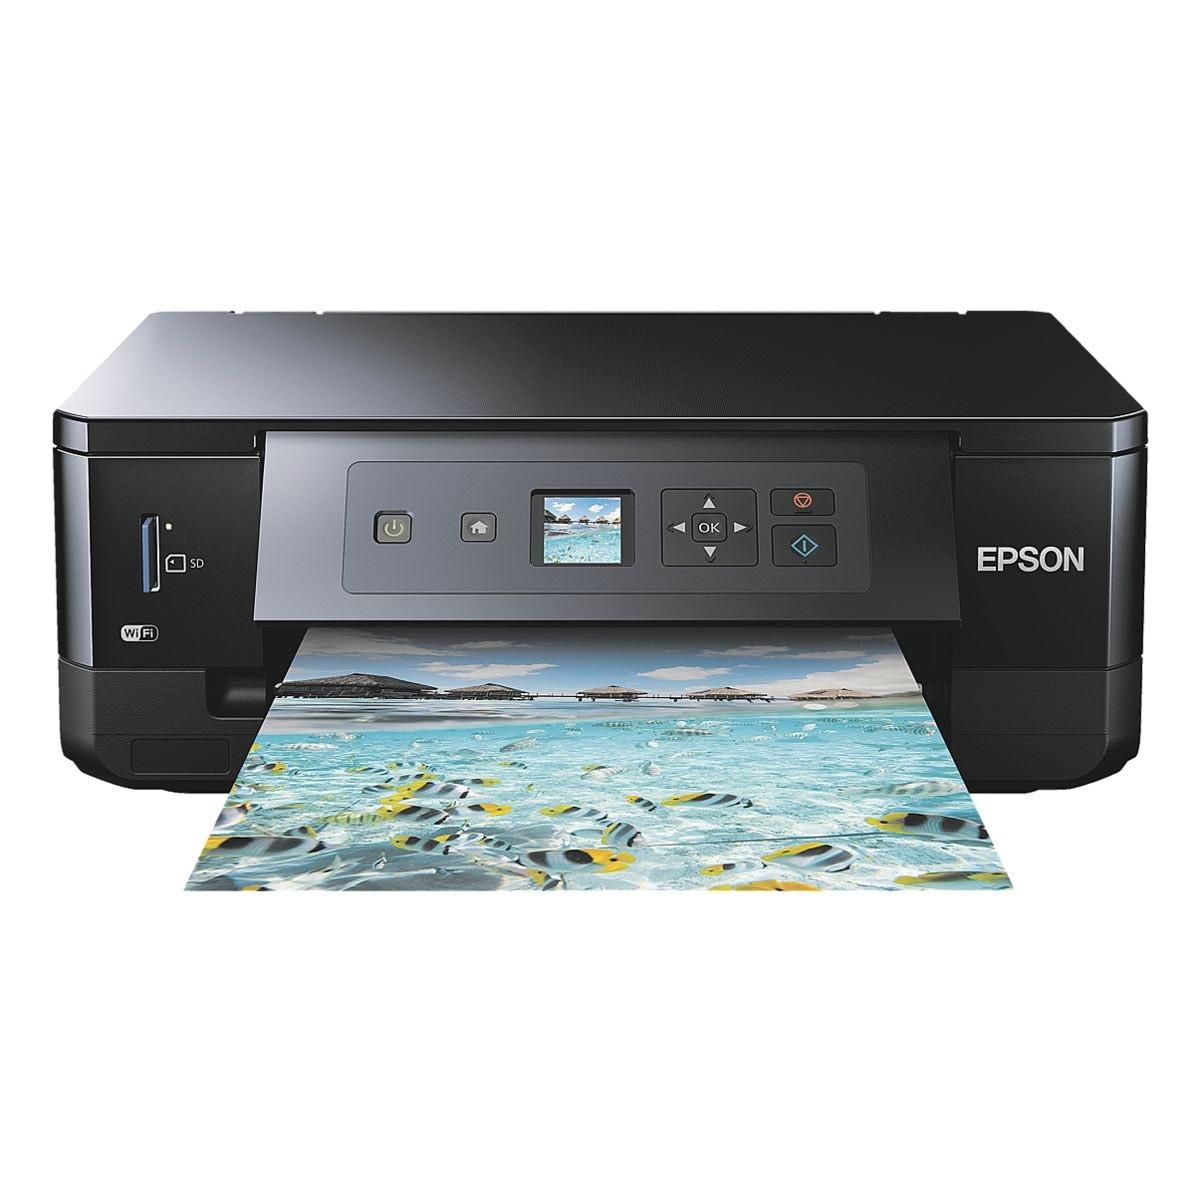 epson multifunktionsdrucker expression premium xp 540. Black Bedroom Furniture Sets. Home Design Ideas